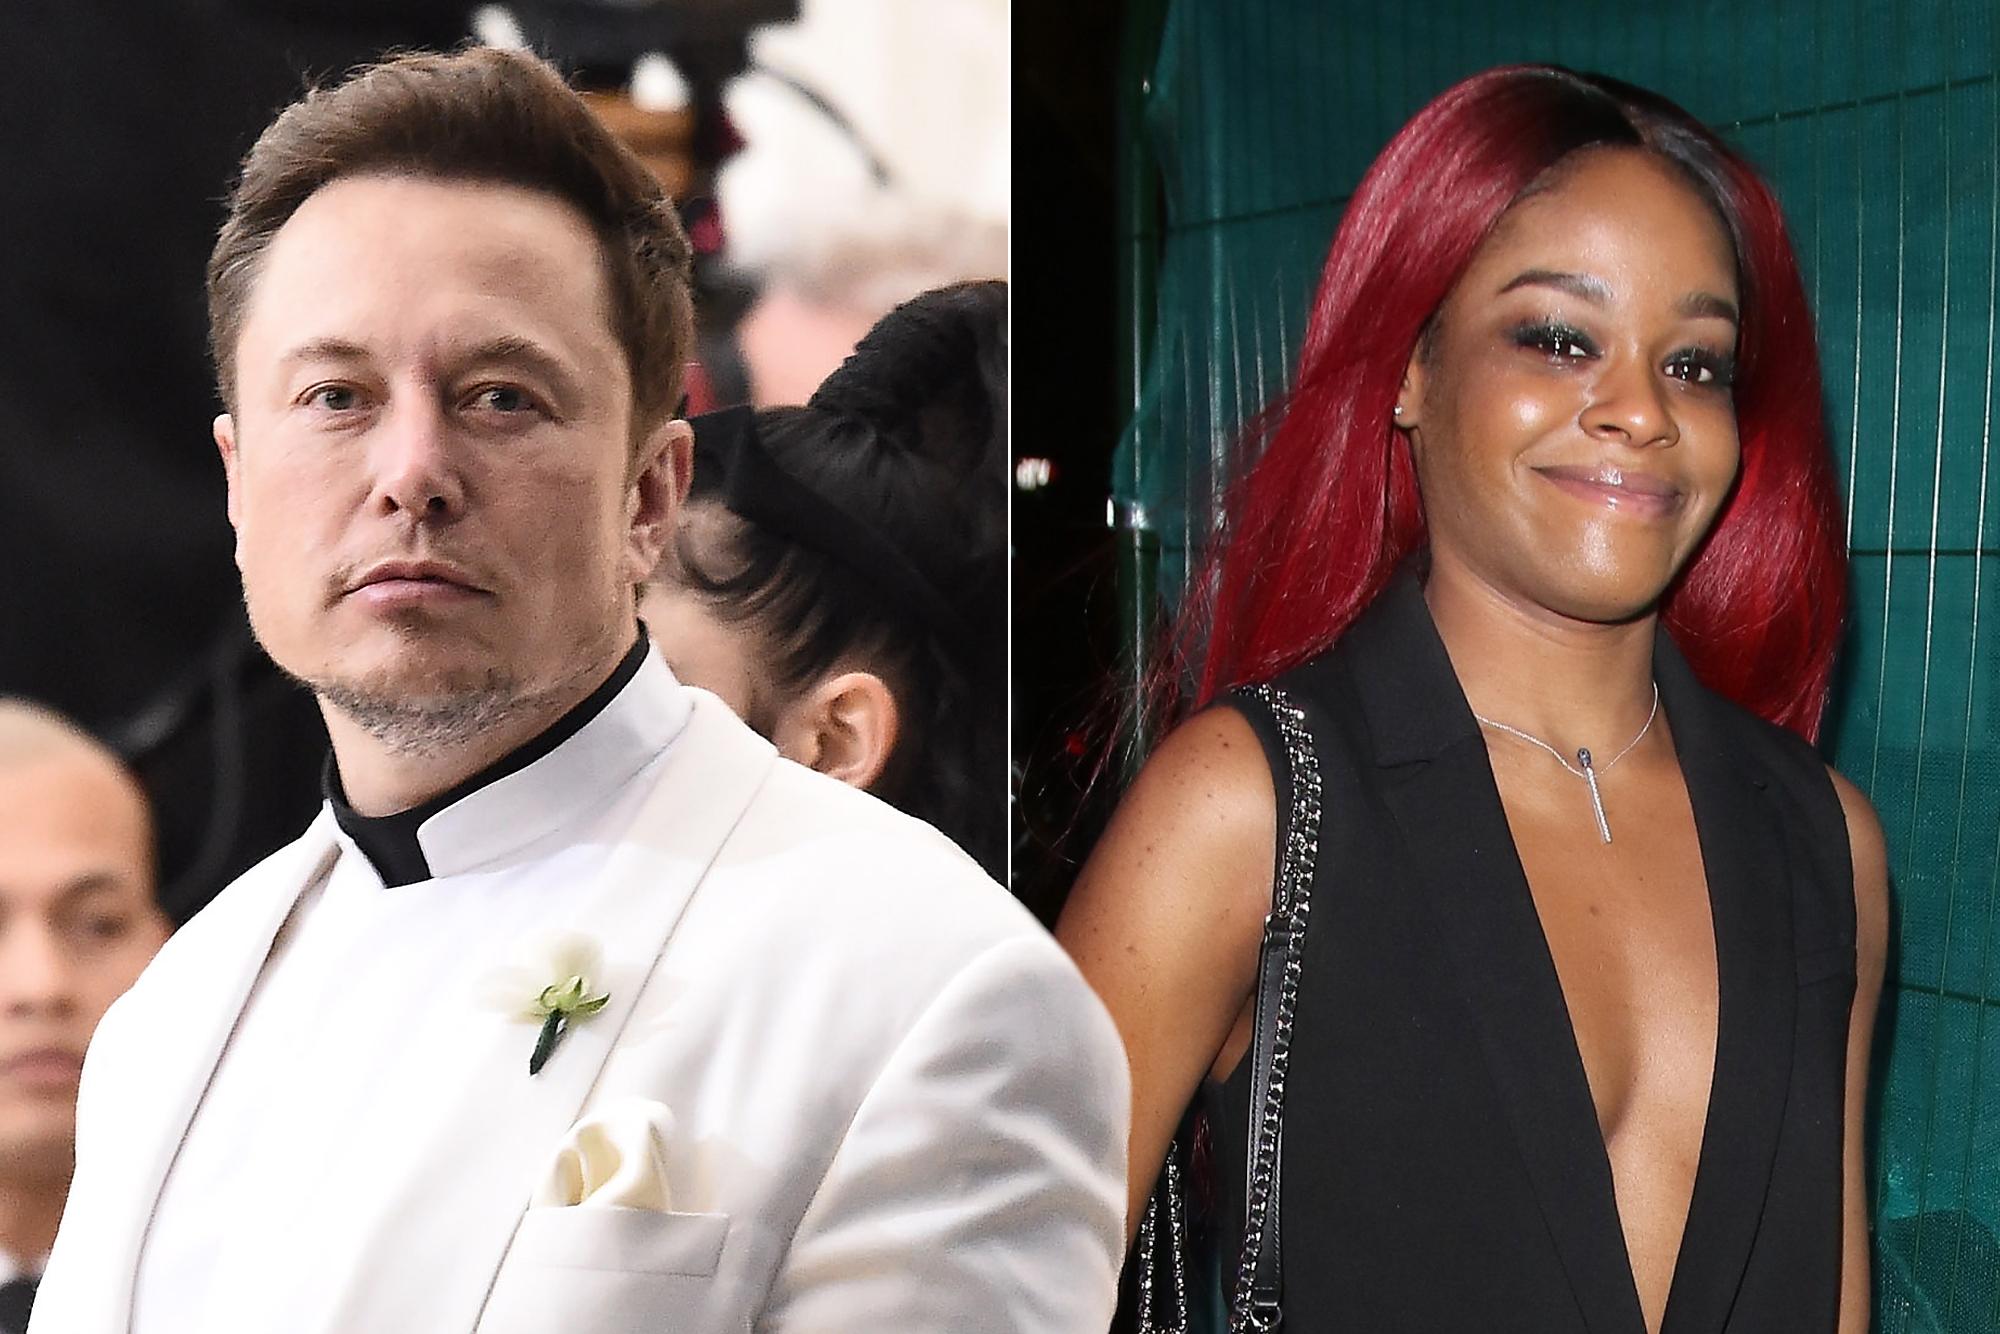 Elon Musk says he has never met Azealia Banks